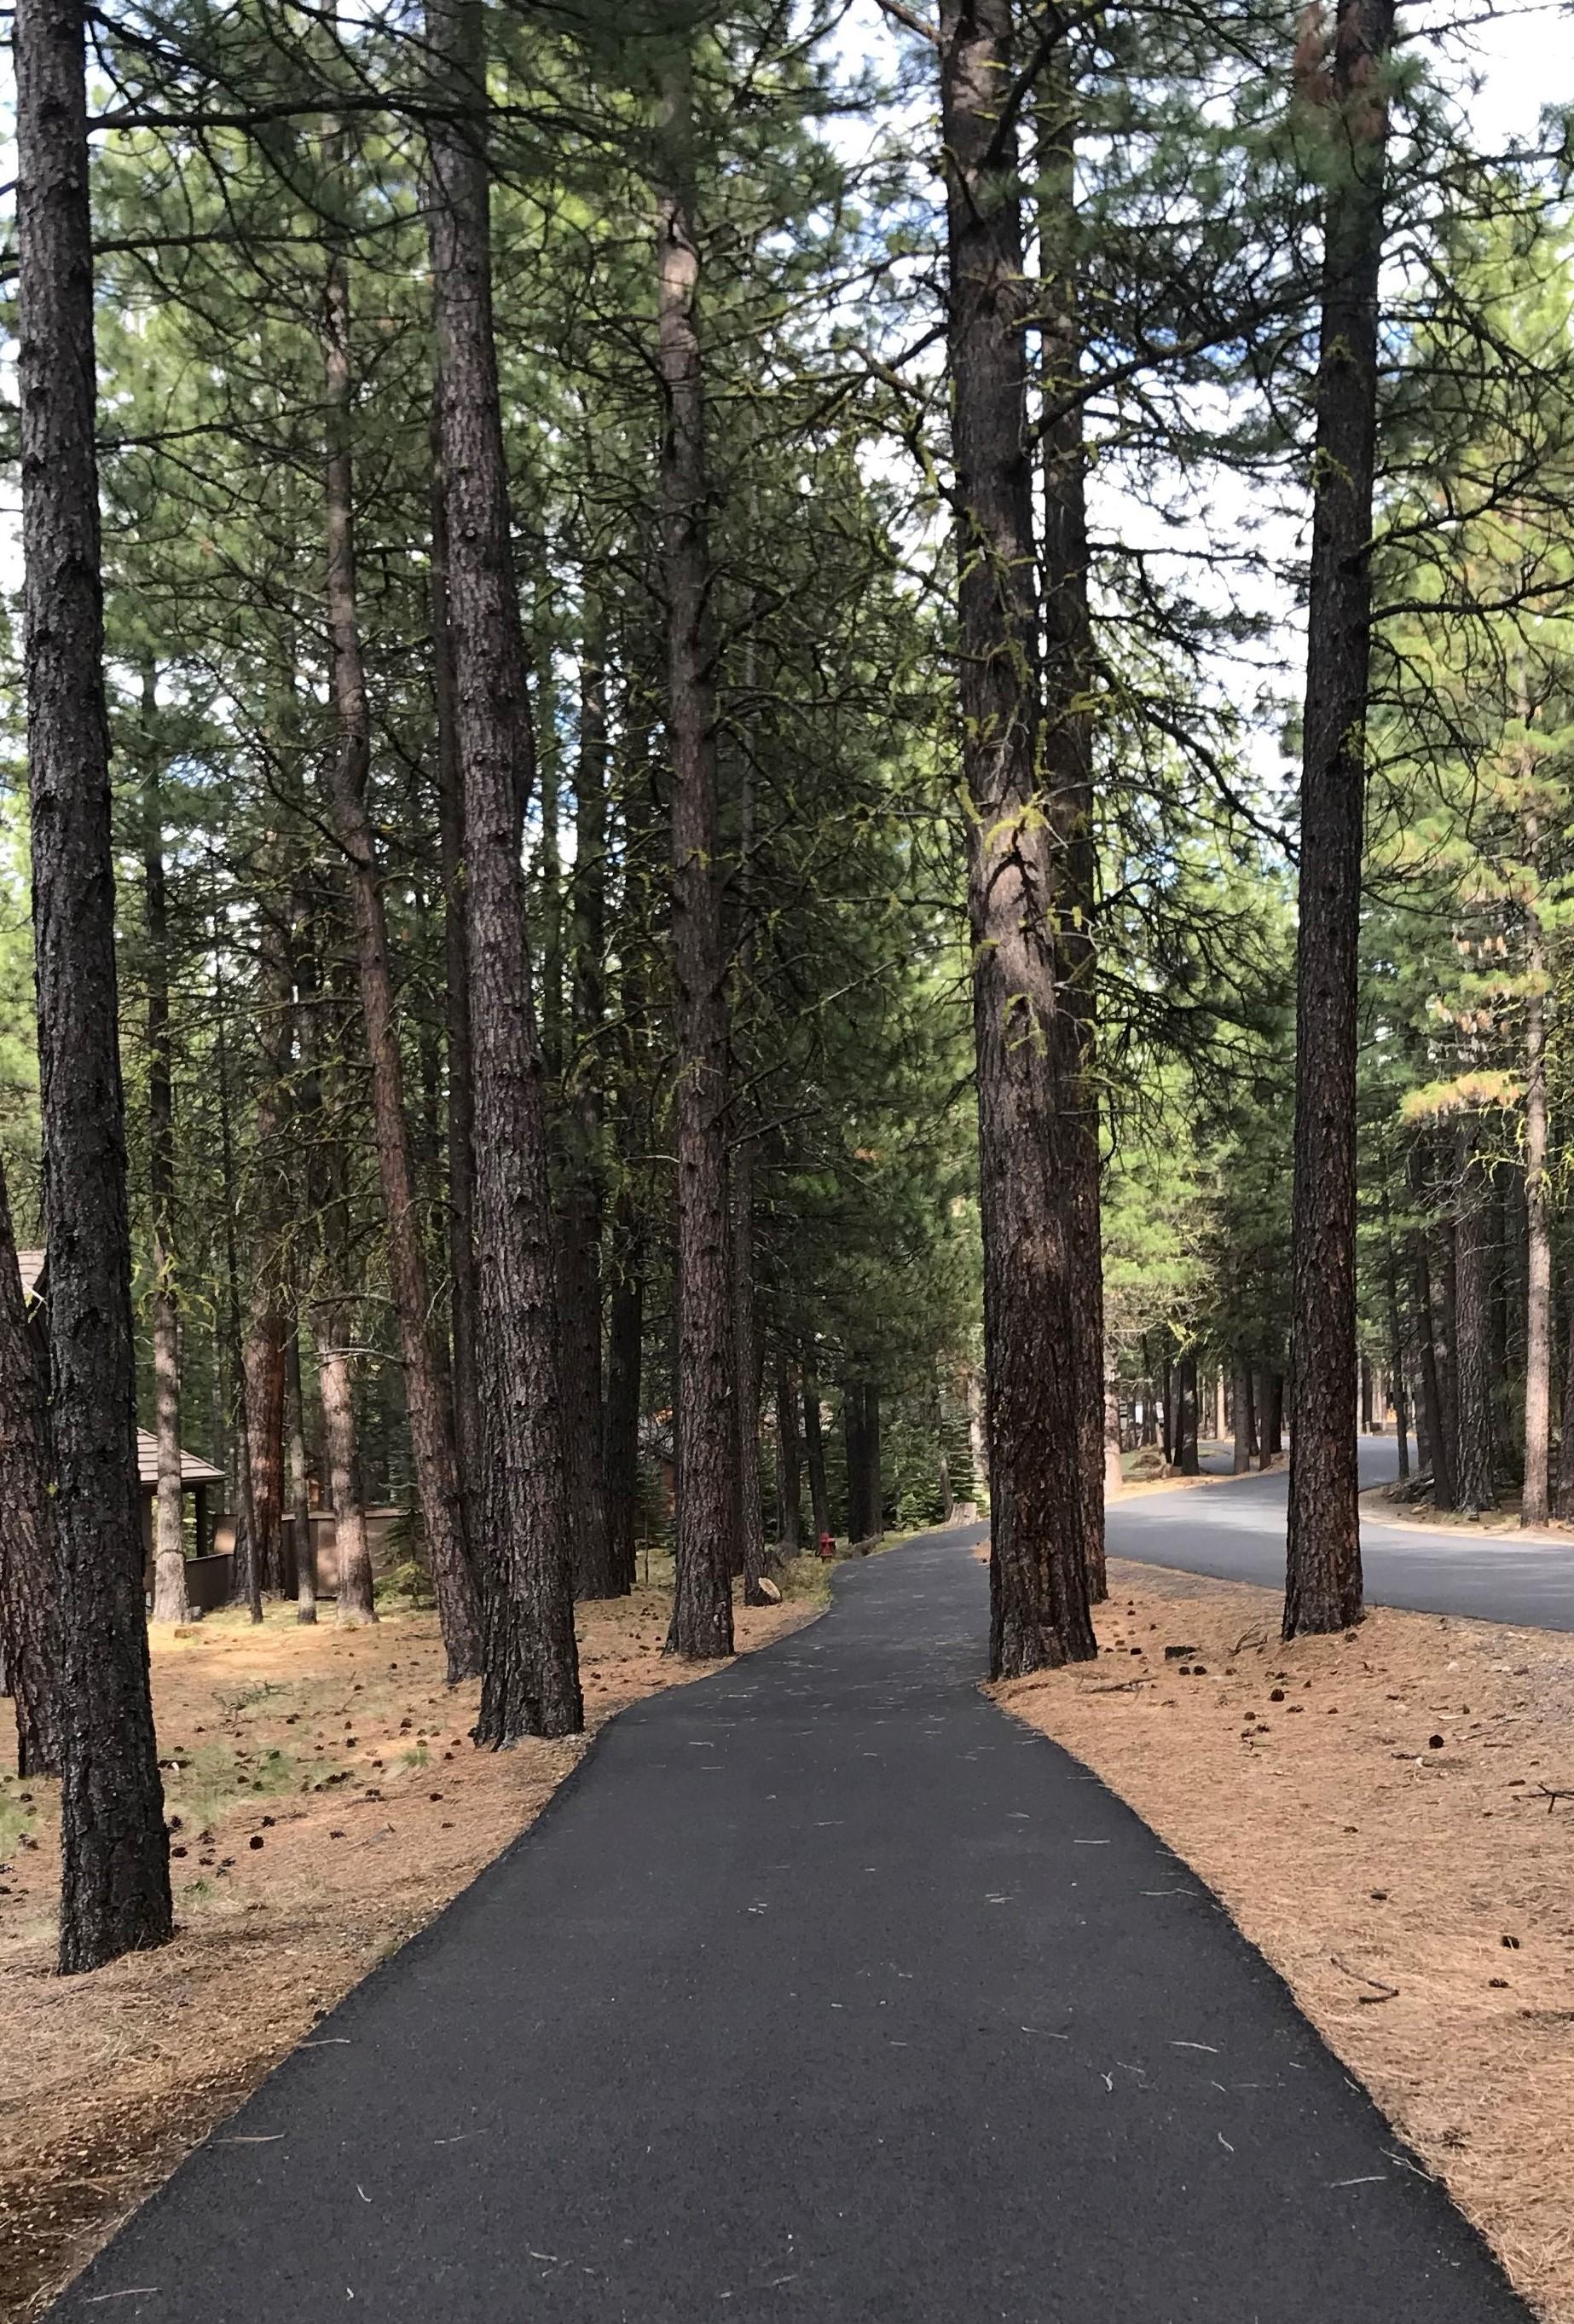 Bike Path, Image Credit: Bucky Fuchs